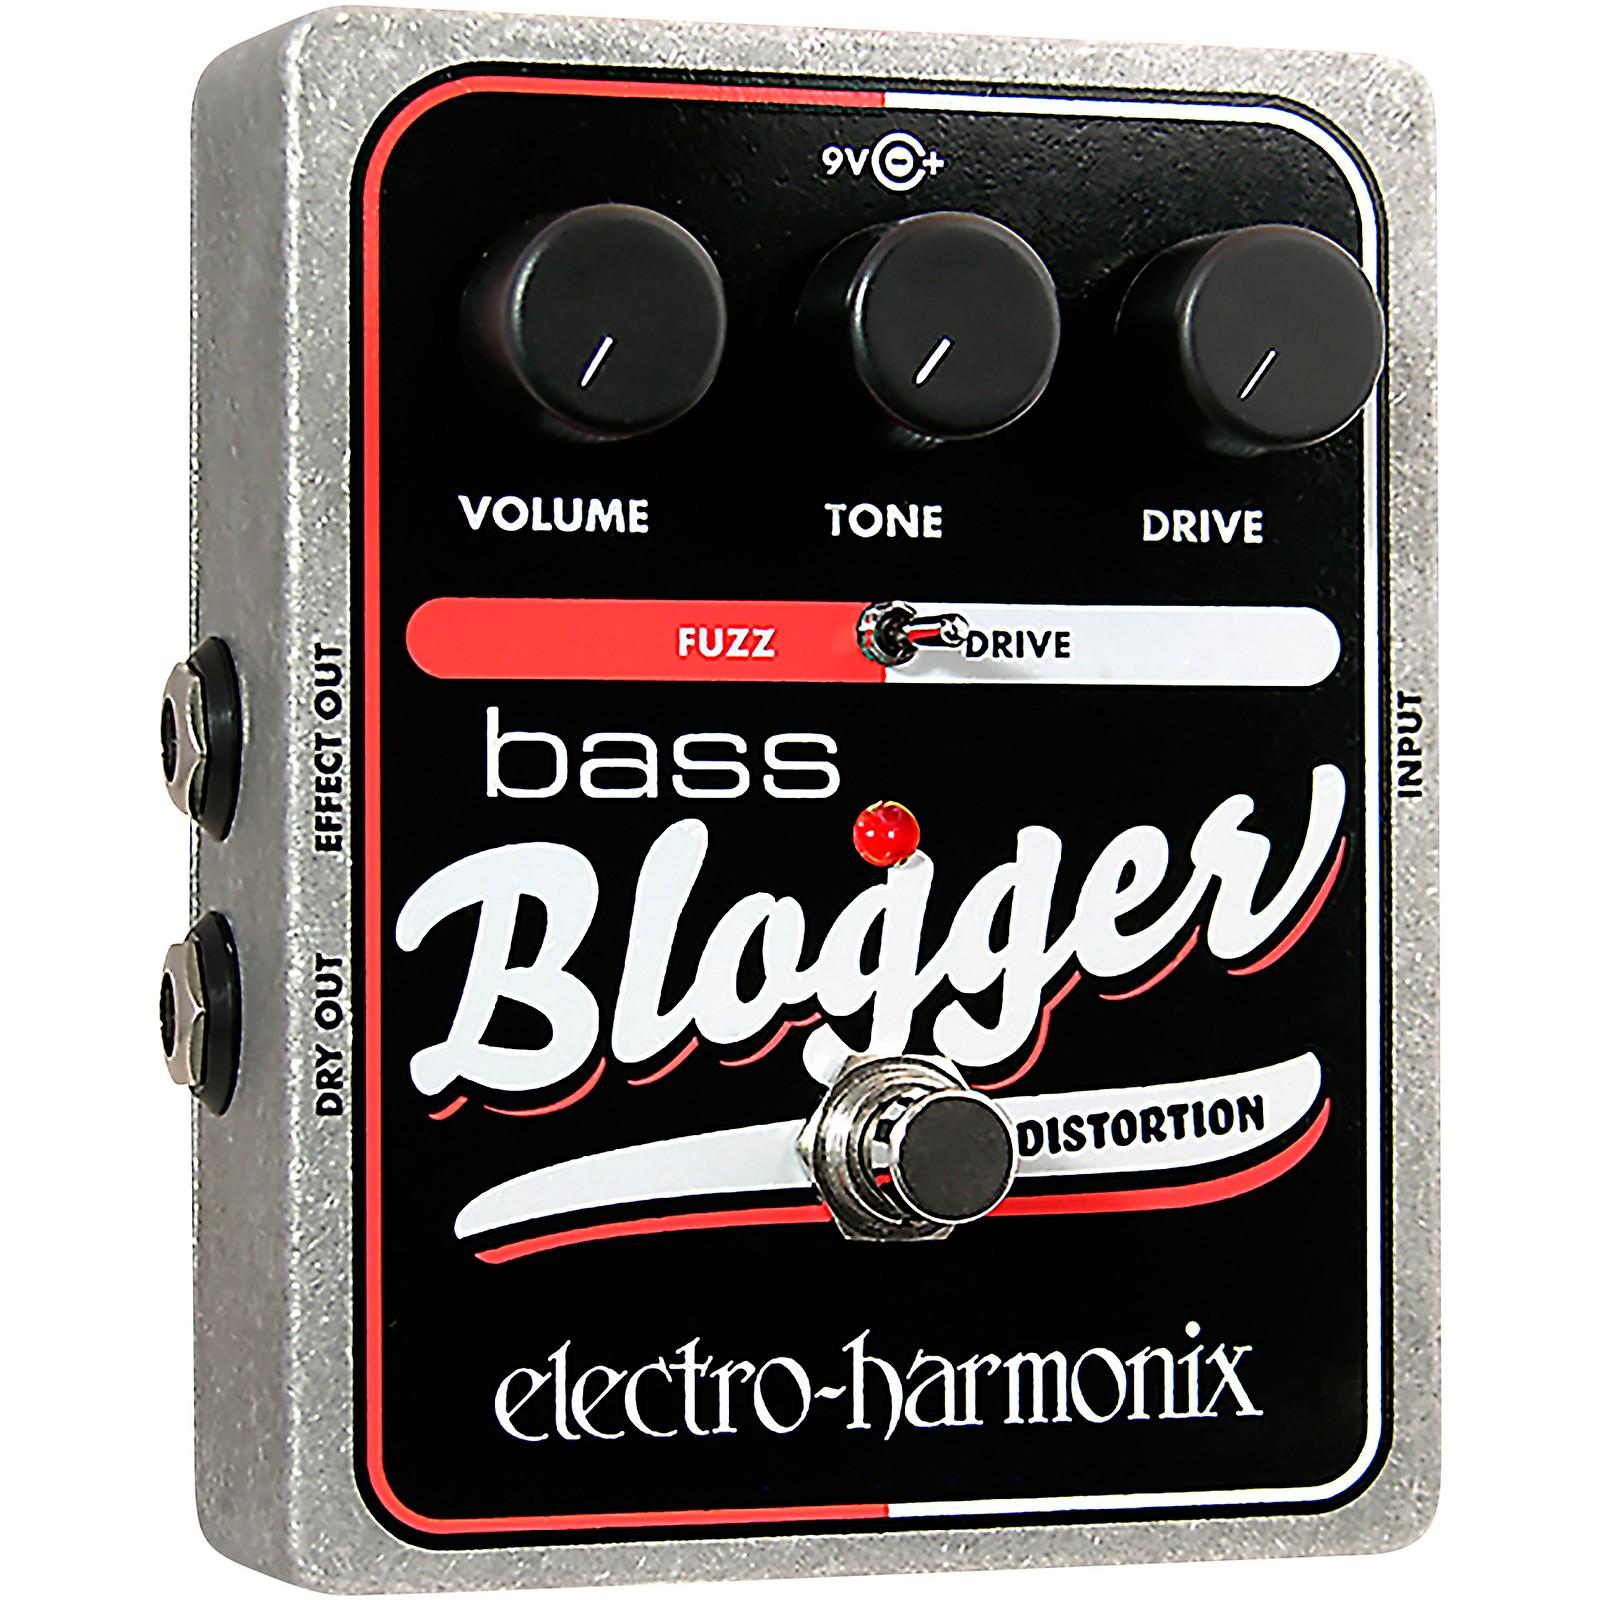 Electro-Harmonix XO Bass Blogger Distortion Effects Pedal